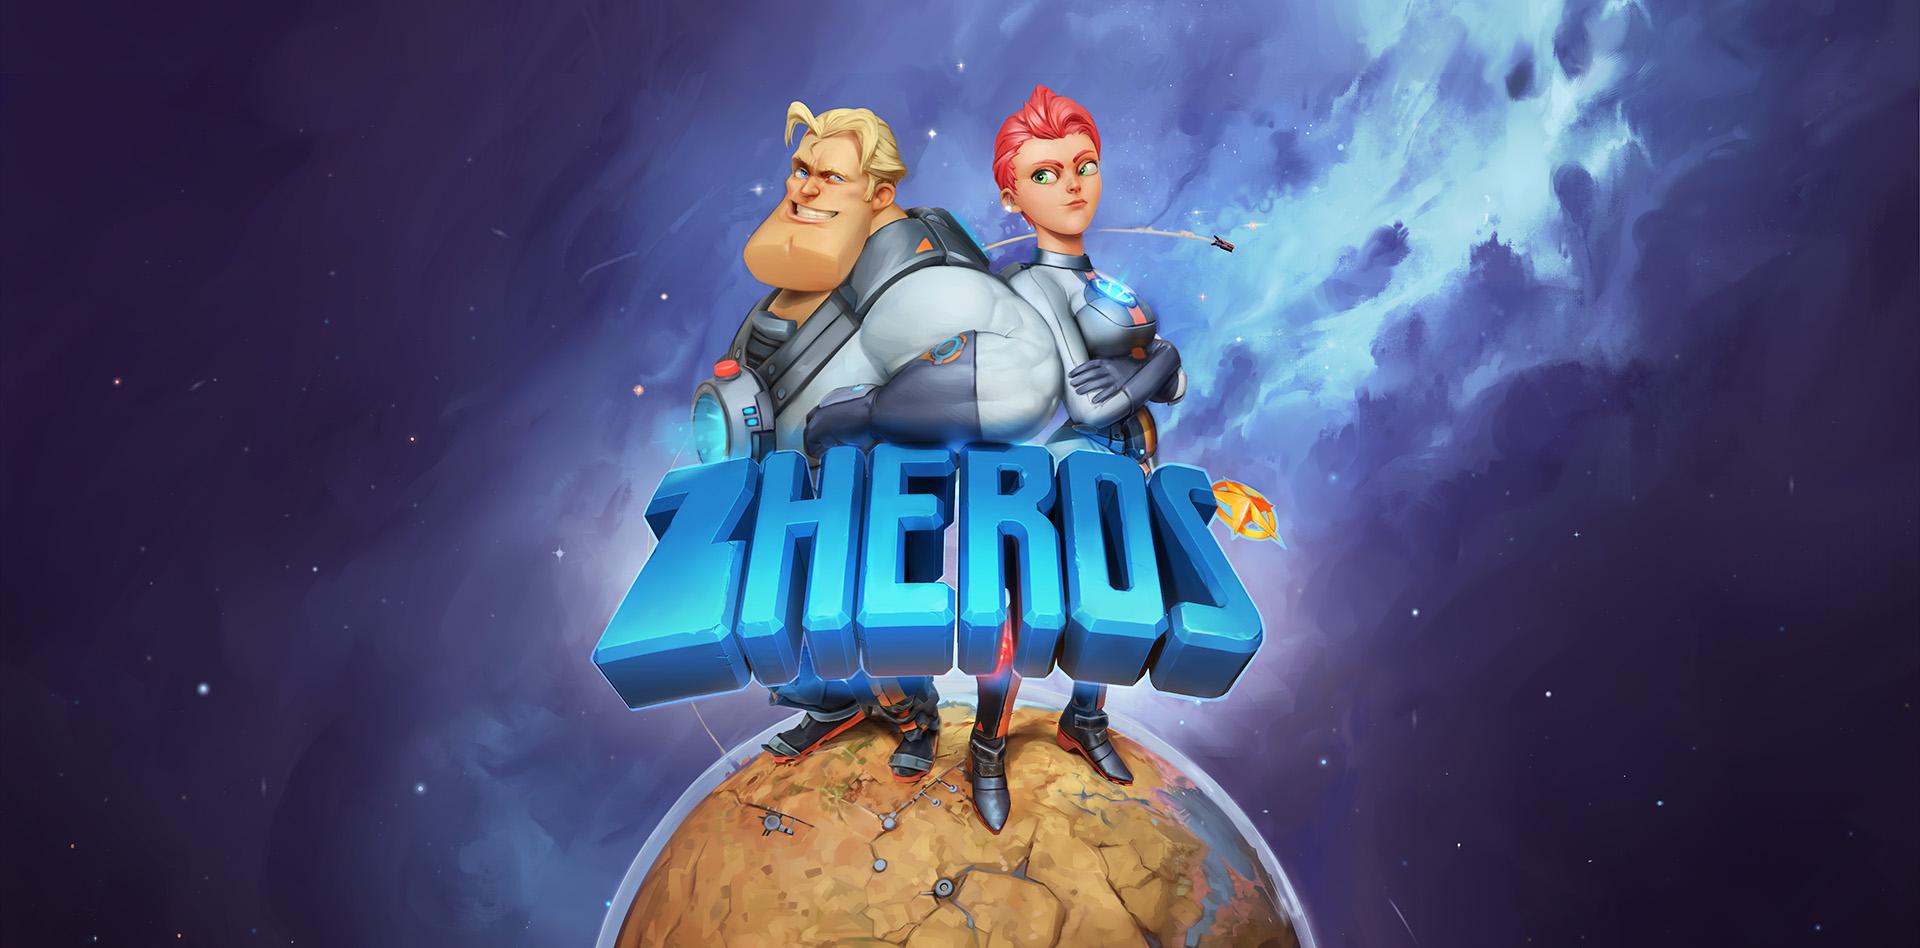 Zheros: lo sviluppo di un beat'em up